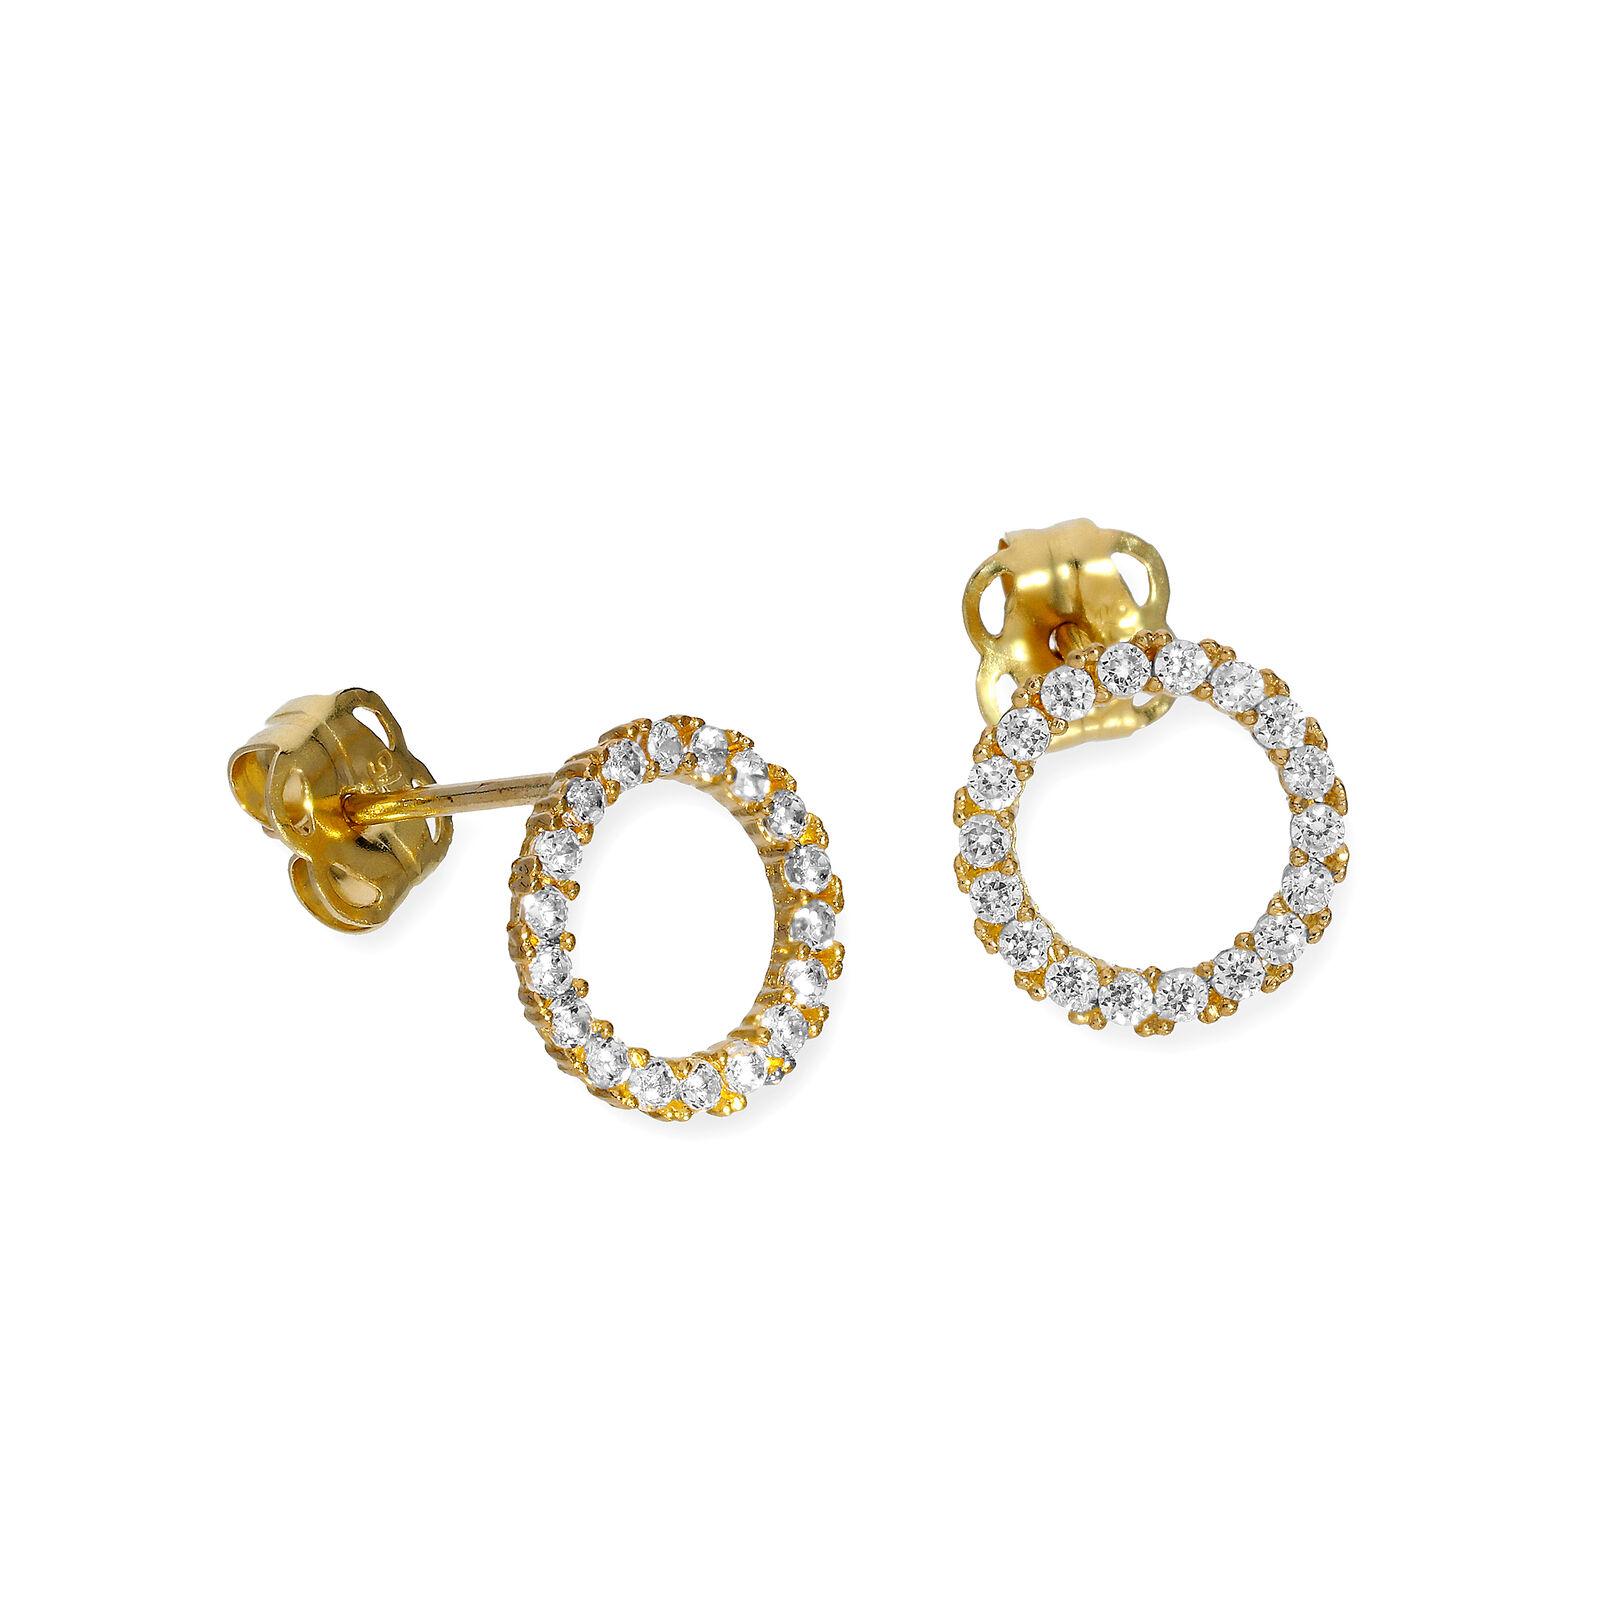 Real 375 9ct gold & Clear CZ Crystal Karma Circle Stud Earrings Wheel Eternity